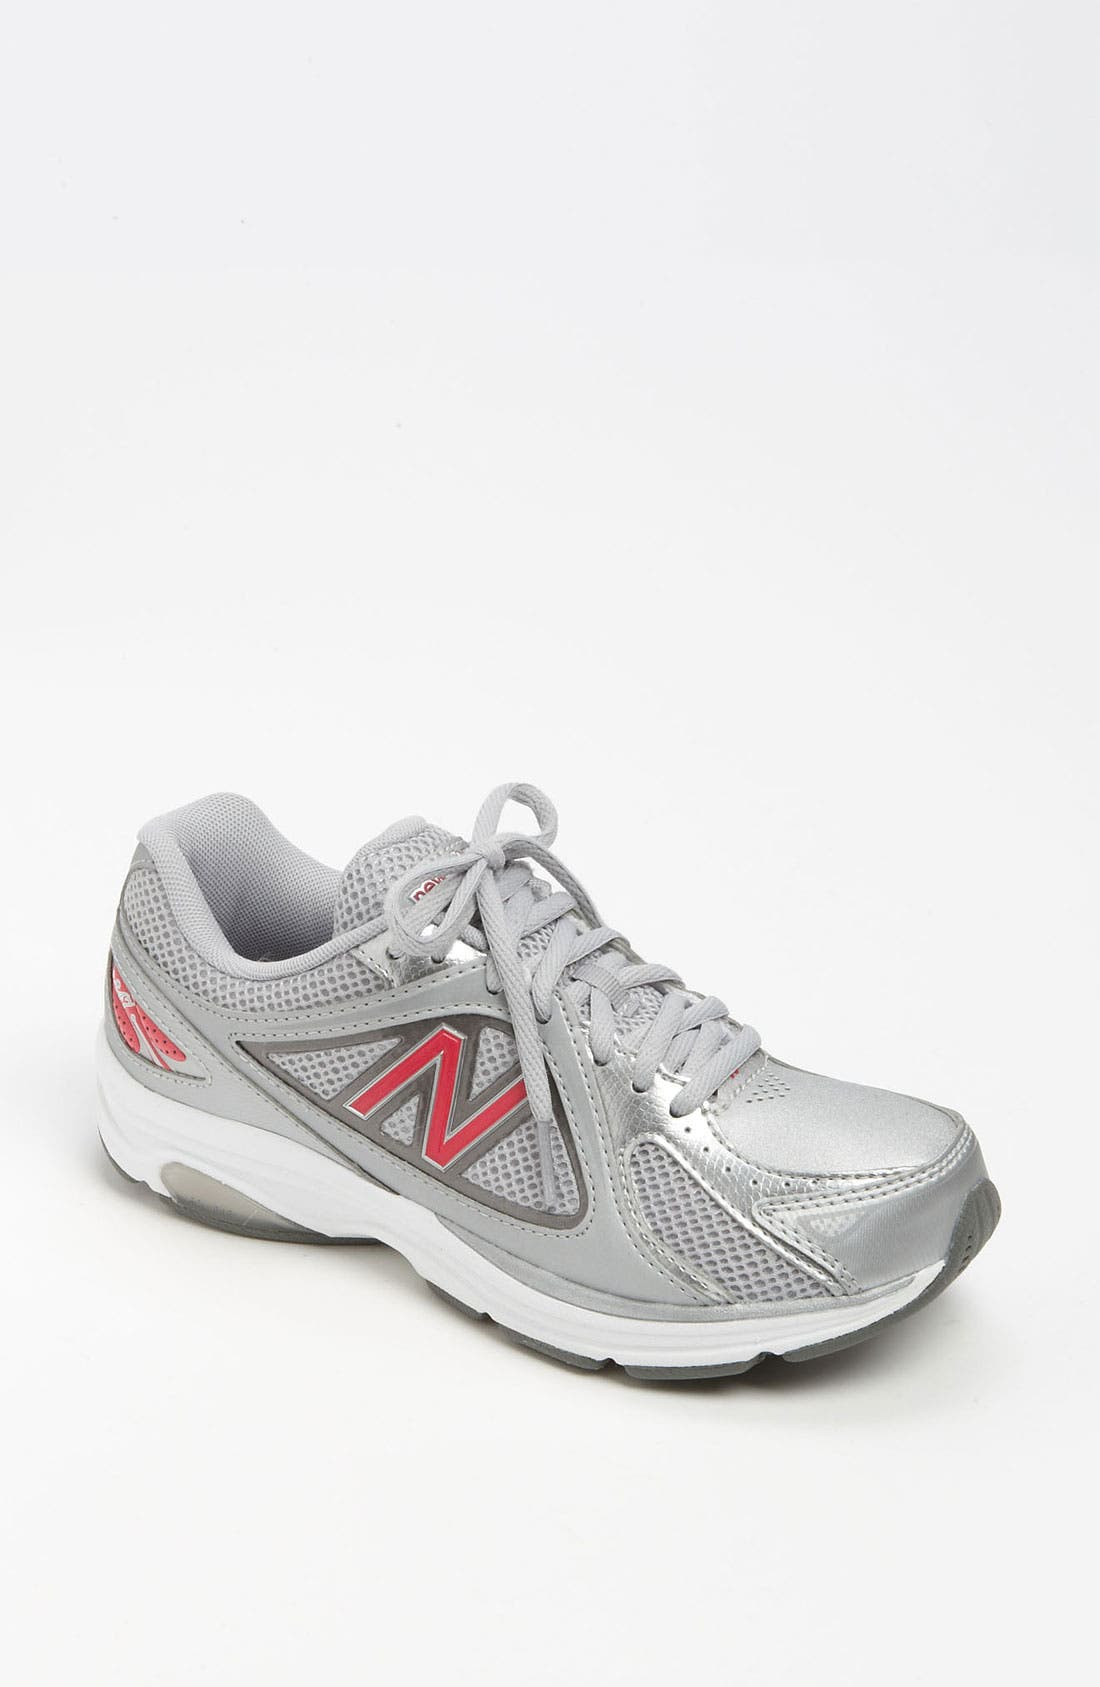 Alternate Image 1 Selected - New Balance '847' Walking Shoe (Women)